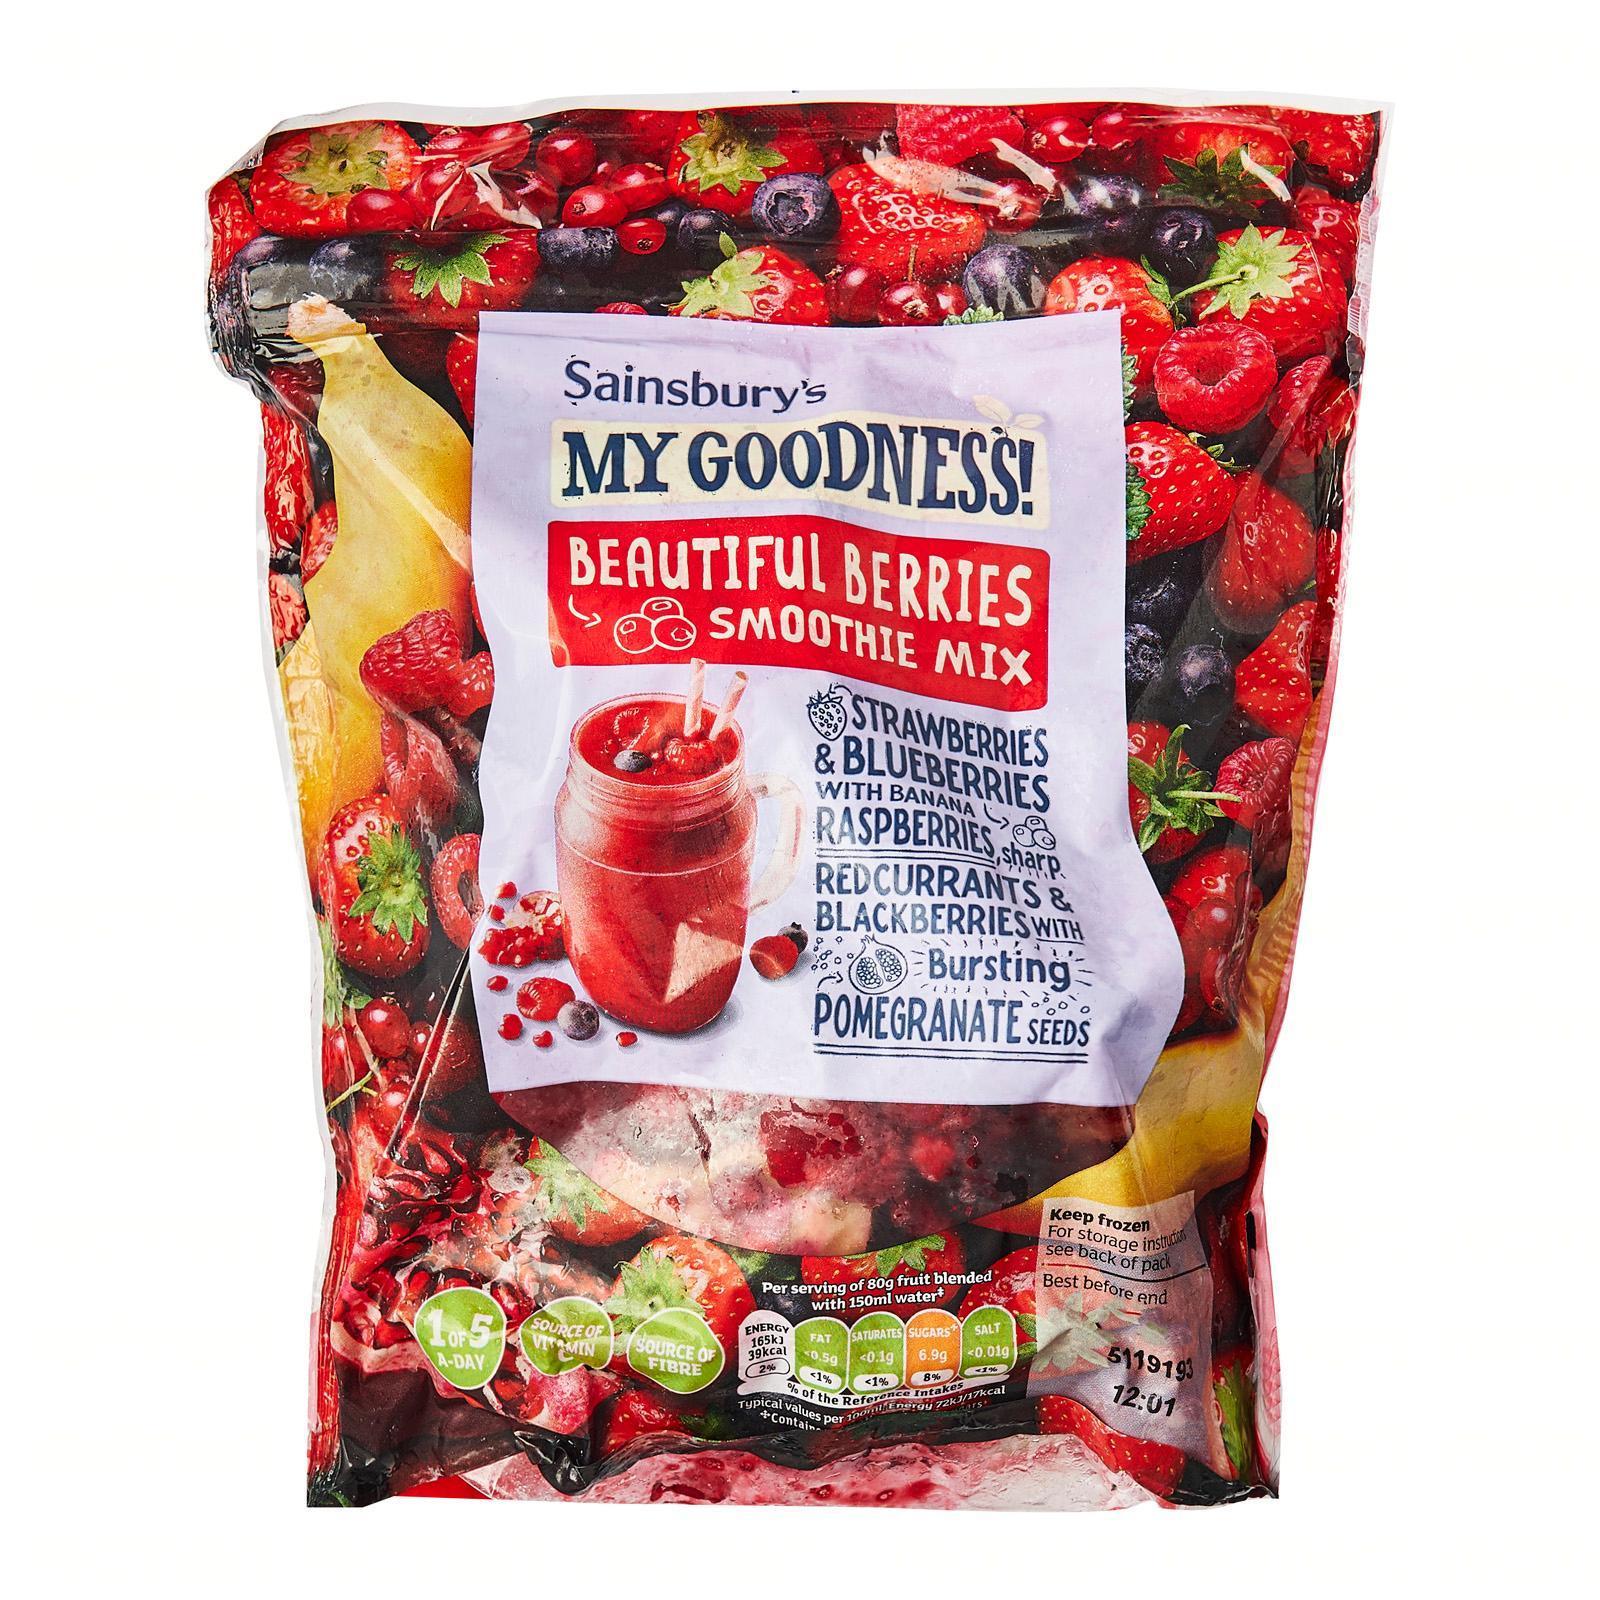 Sainsbury's My Goodness! Beautiful Berries Smoothie Fruits Mix - Frozen